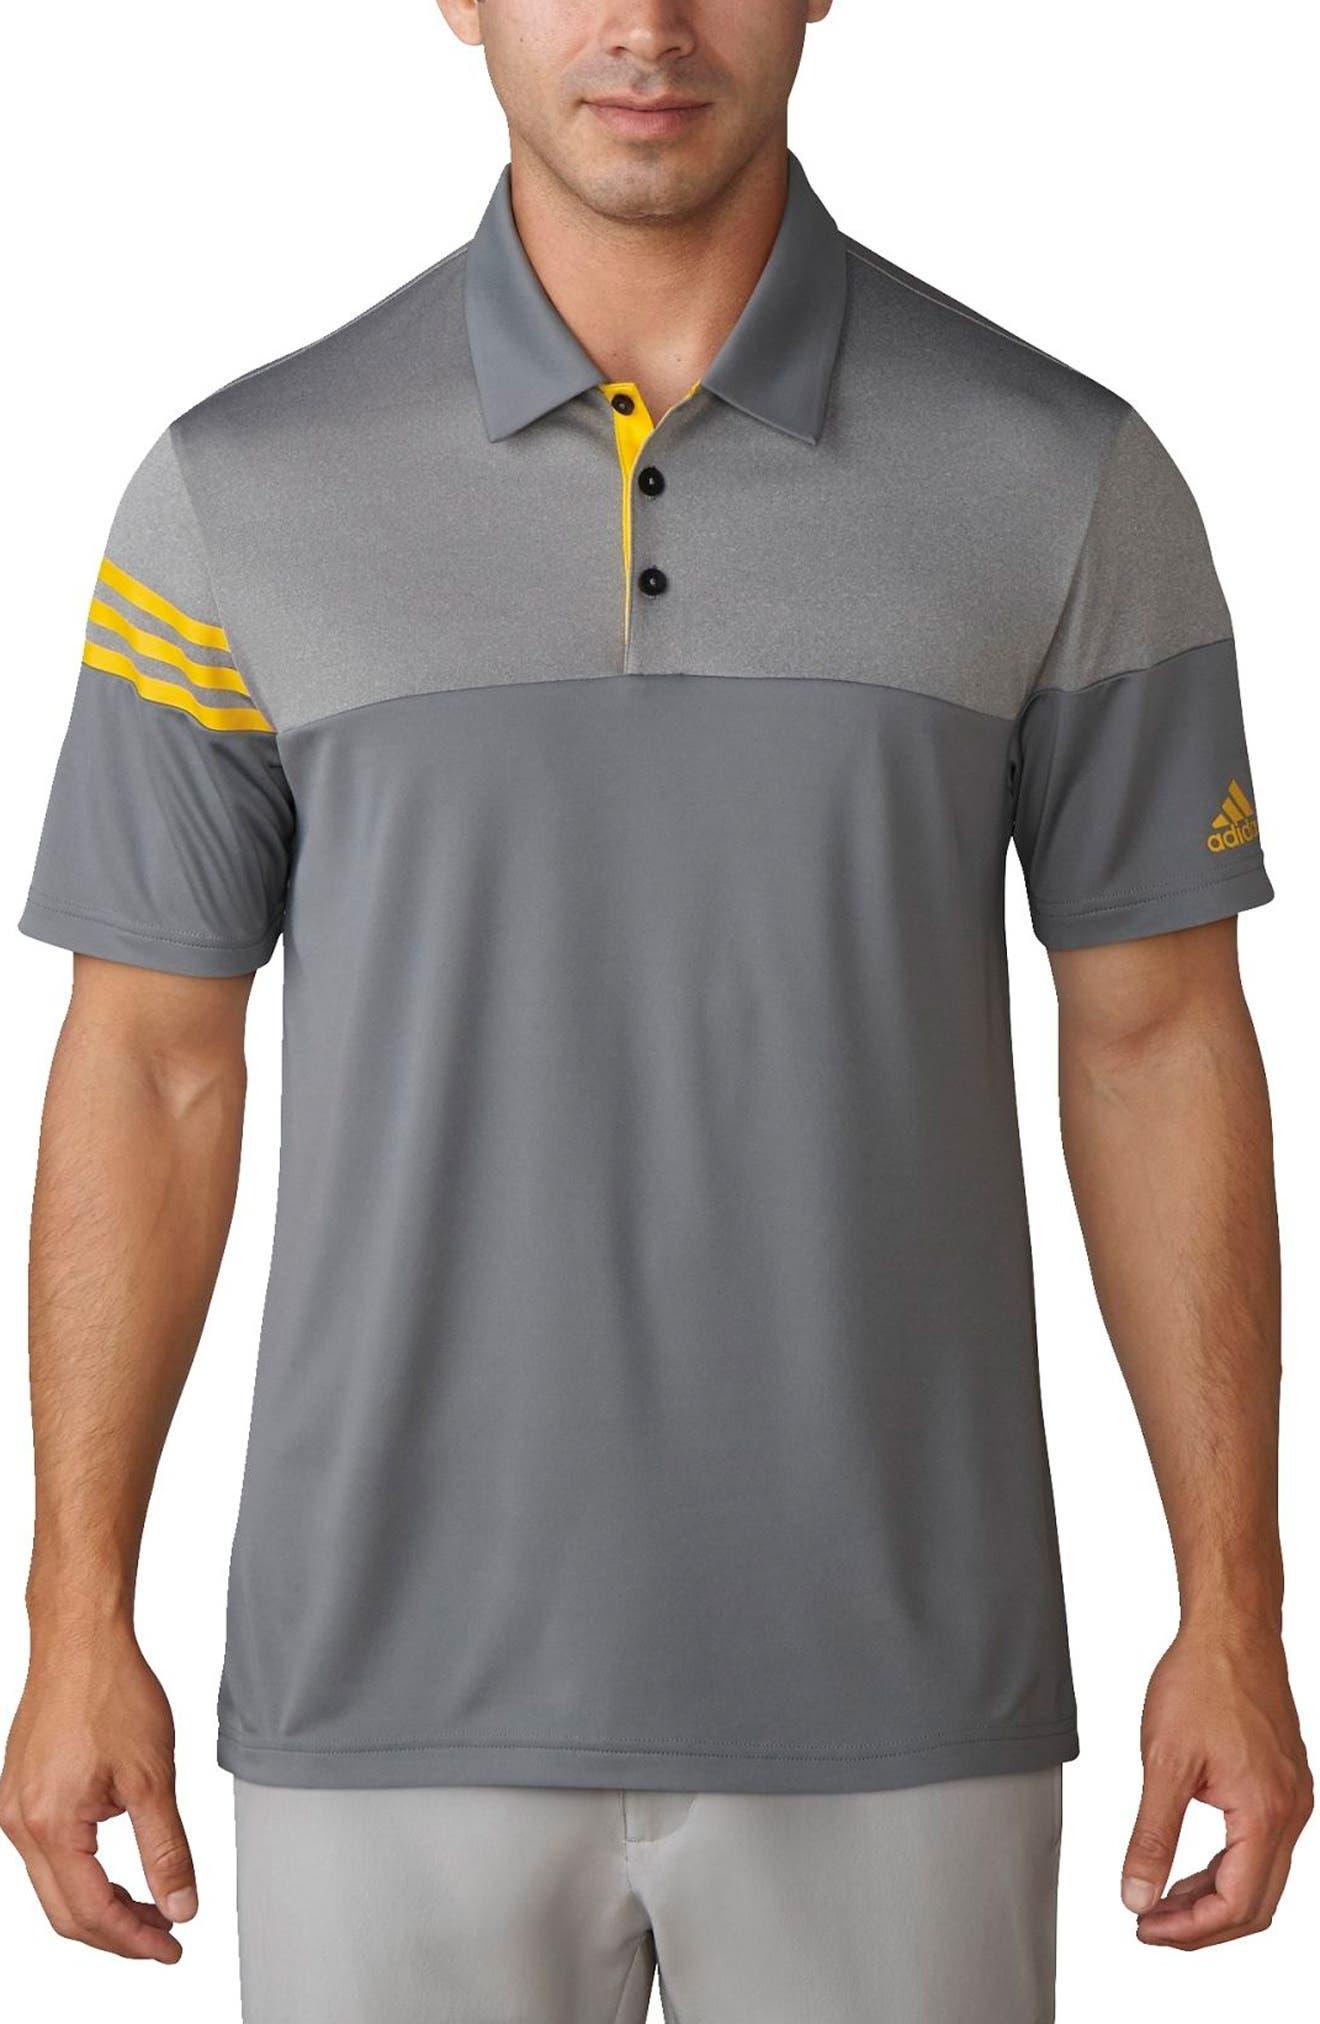 Main Image - adidas Regular Fit 3-Stripes Golf Polo